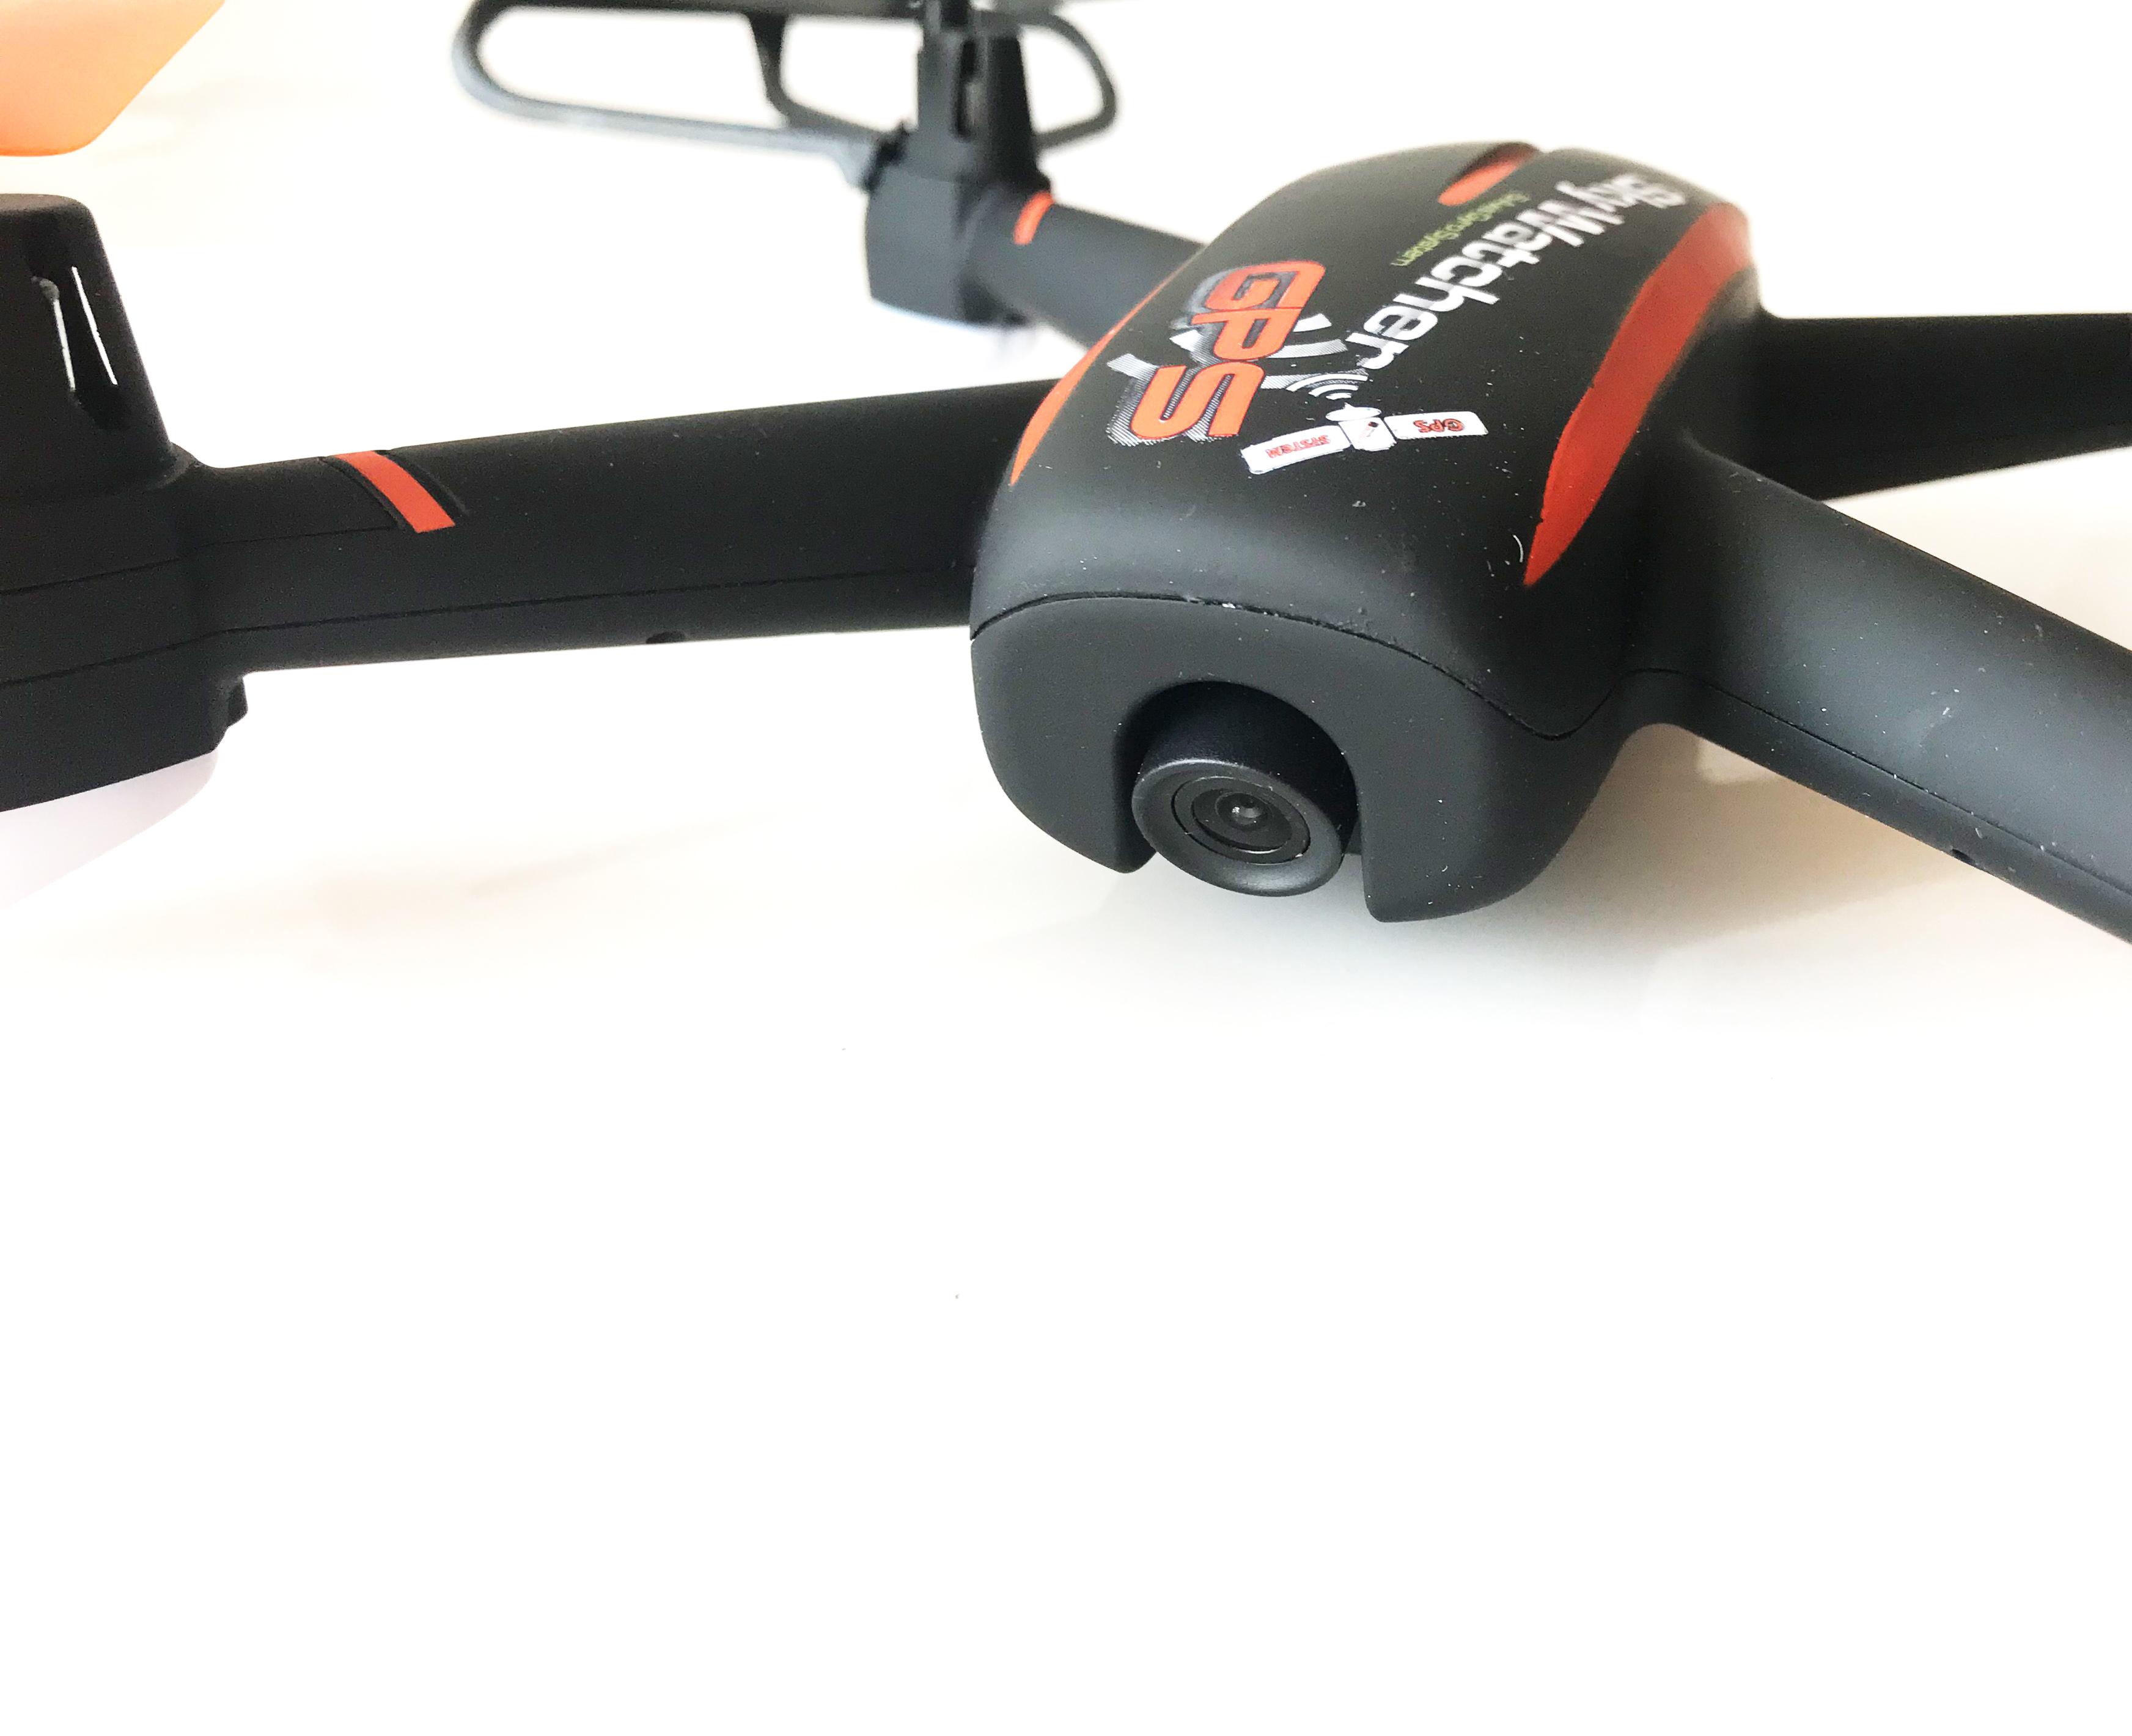 SkyWatcher GPS FPV Follow ME Waypoints 18 minut